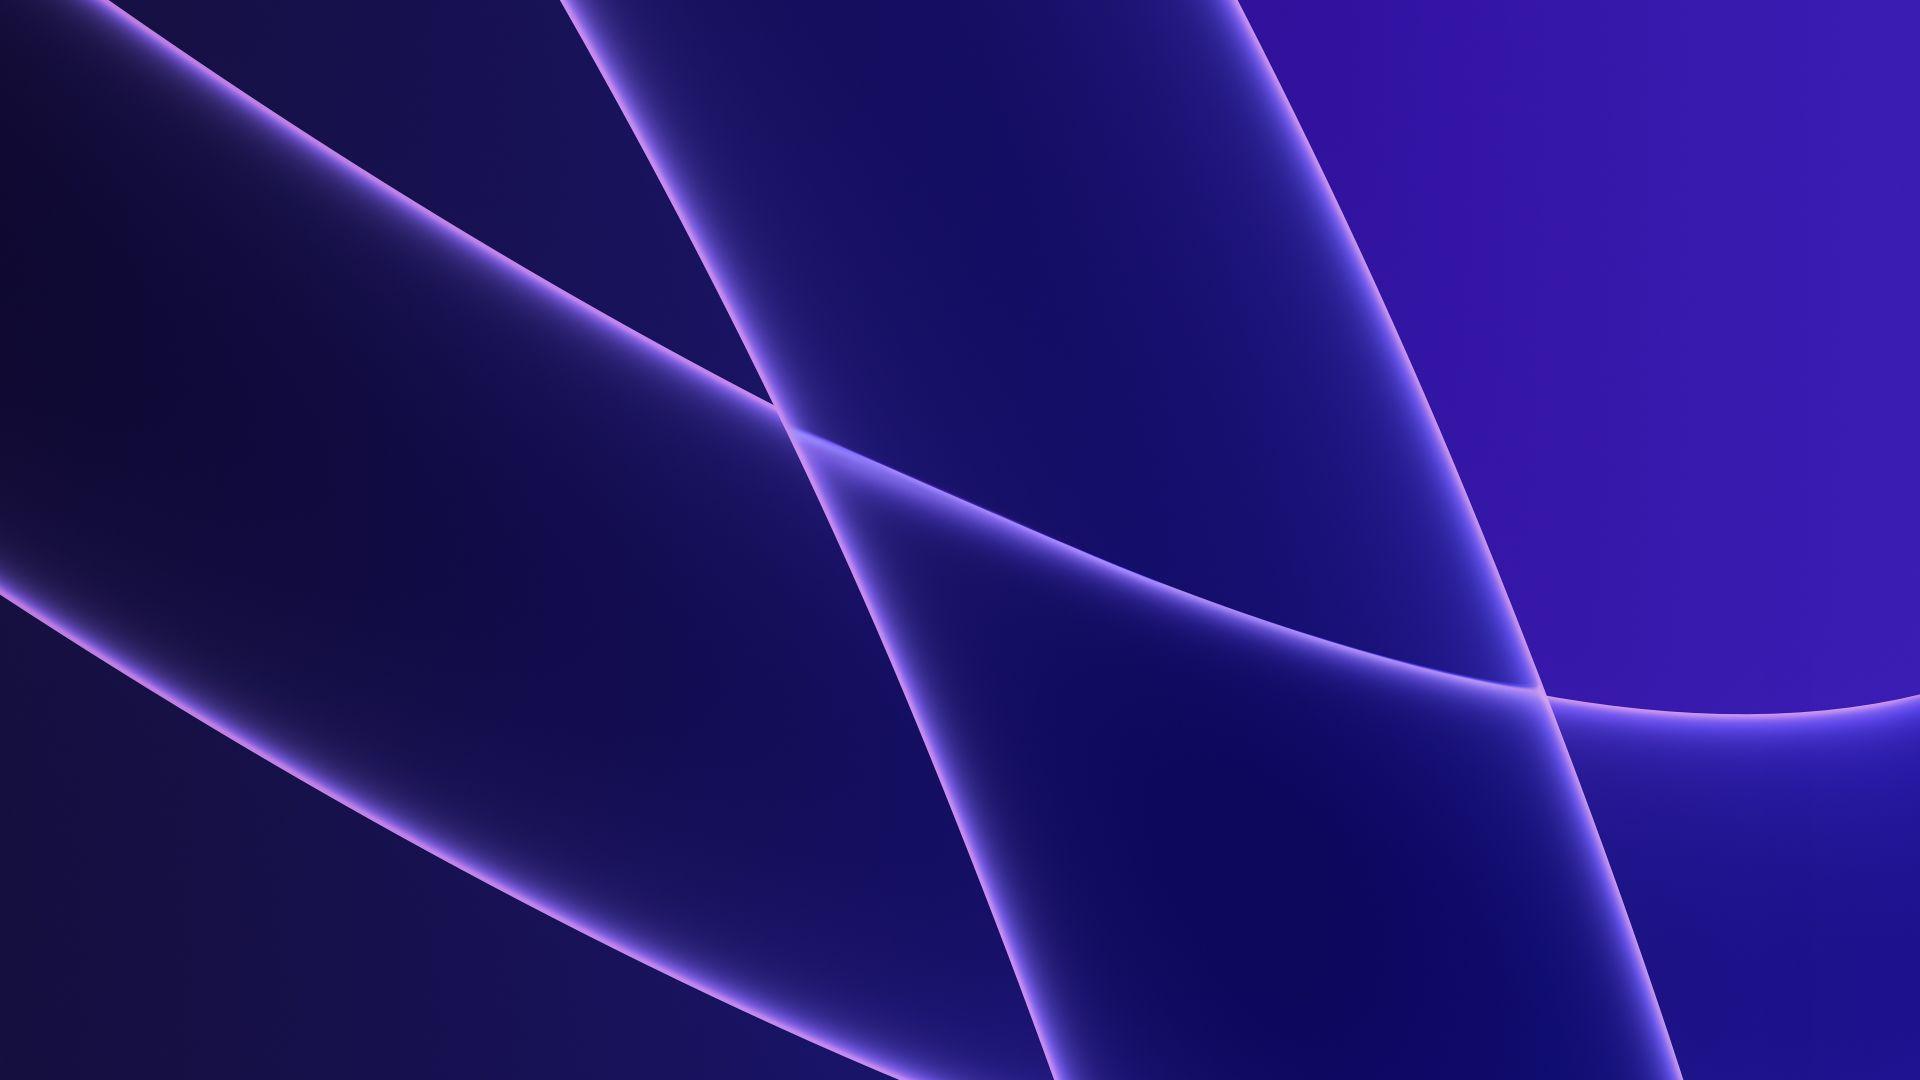 Wallpaper iMac 2021, abstract, Apple April 2021 Event, 4K ...